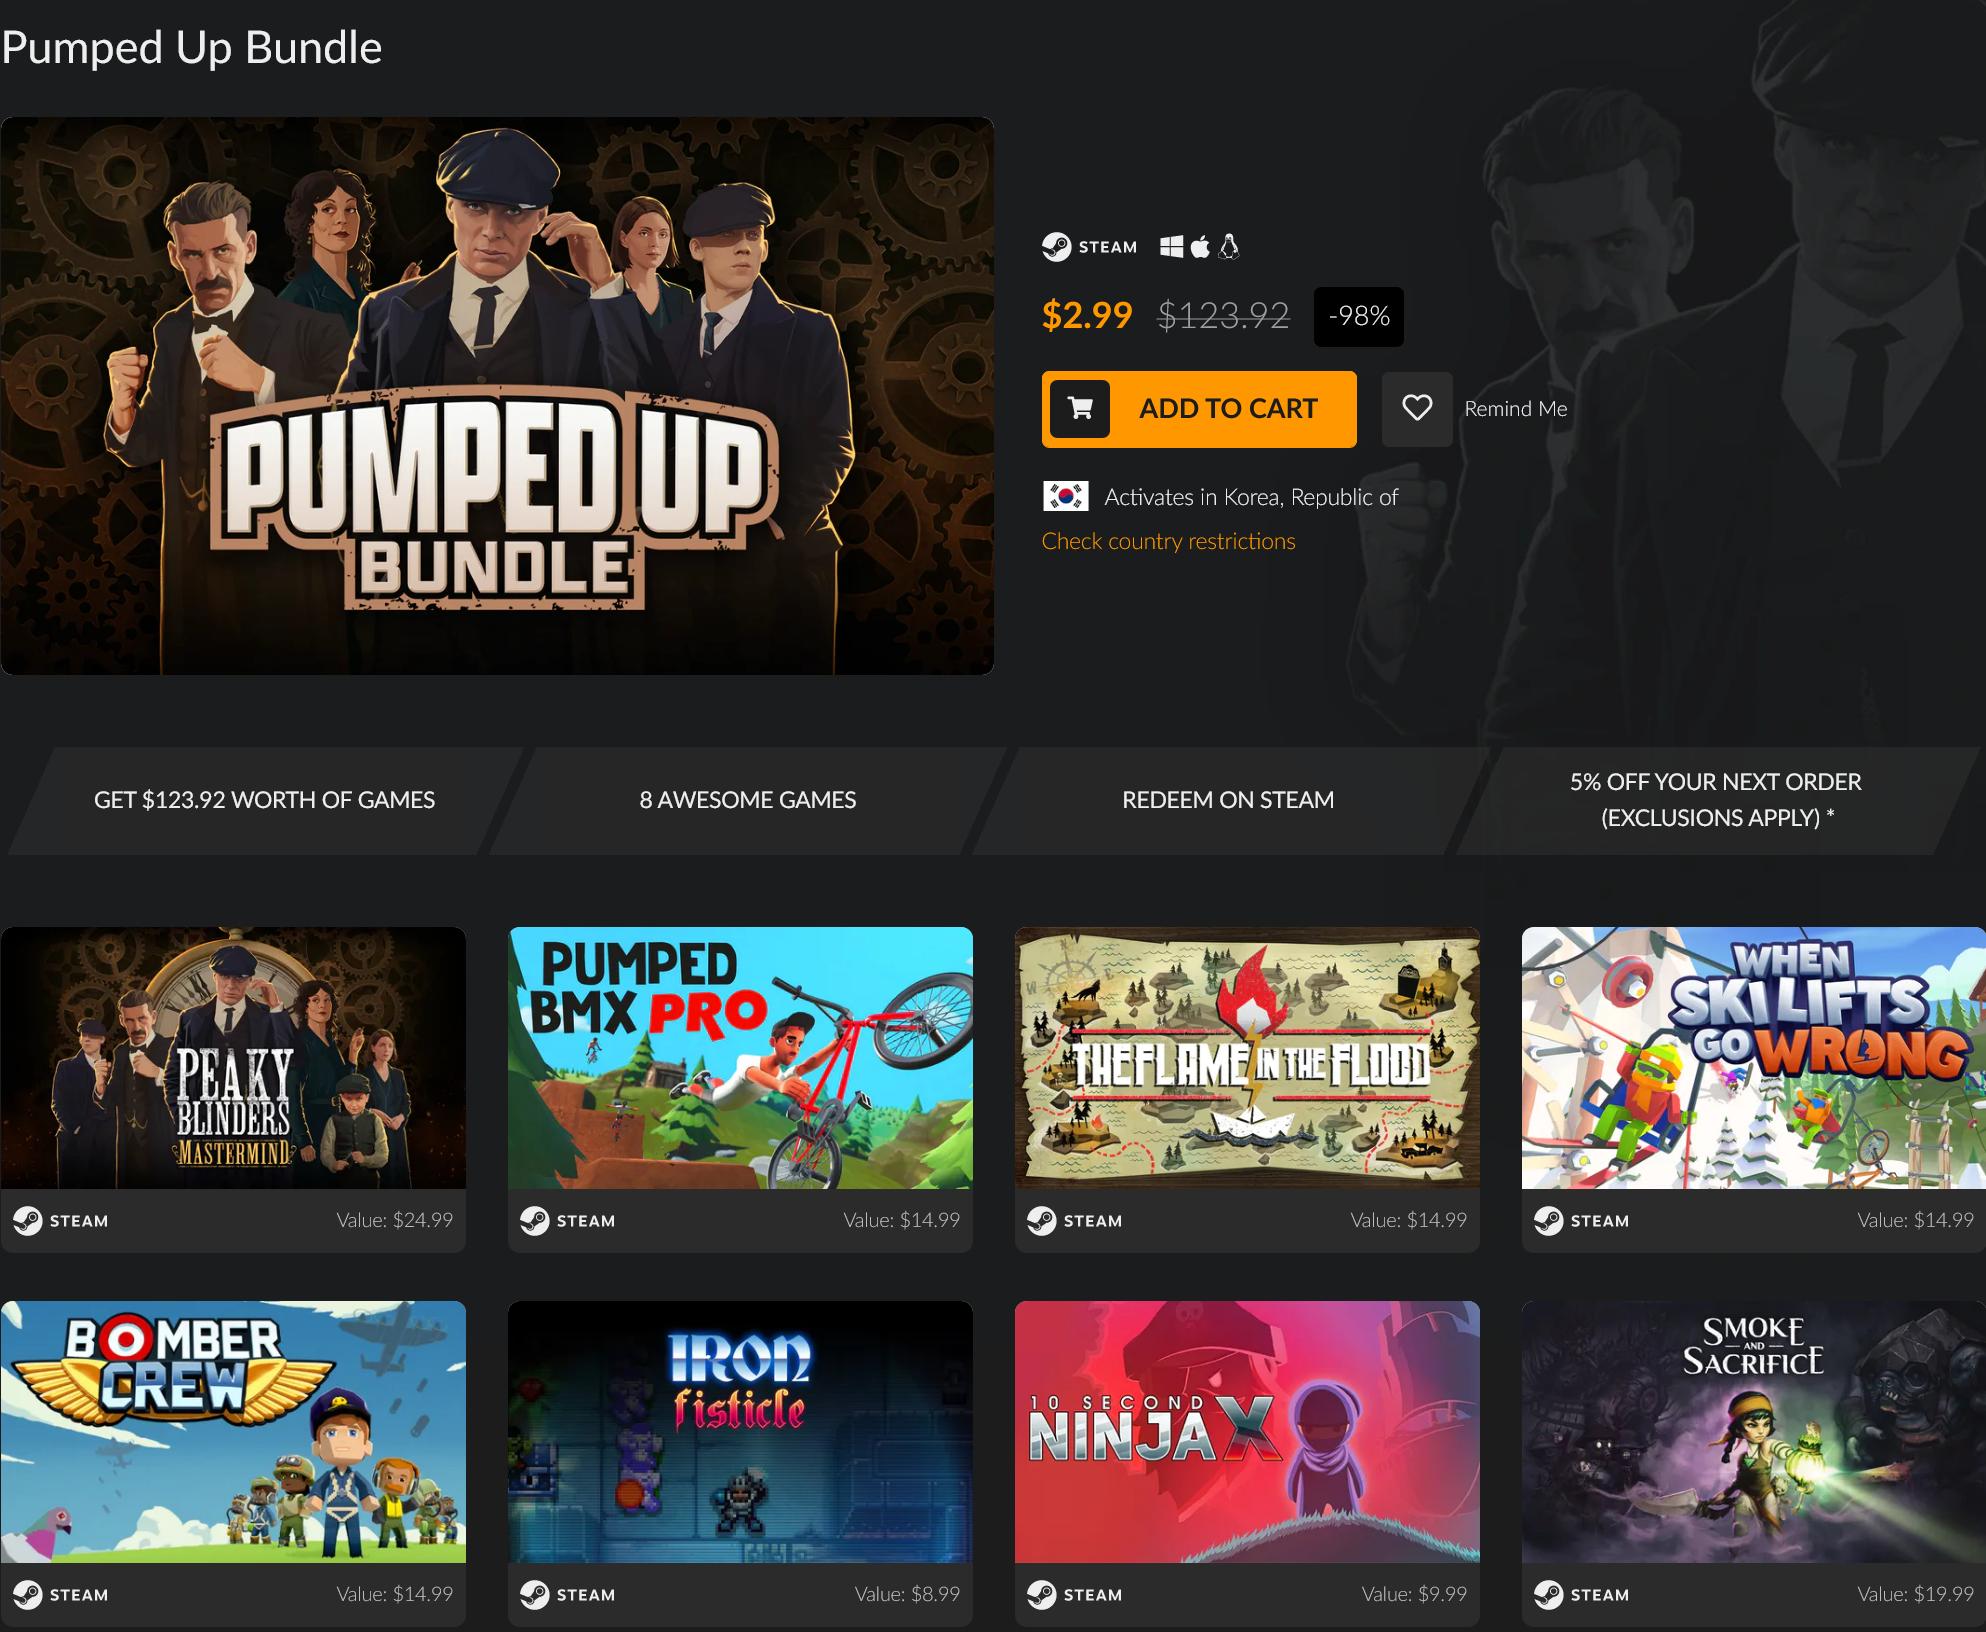 Screenshot 2021-09-23 at 00-10-53 Pumped Up Bundle Steam Game Bundle Fanatical.png